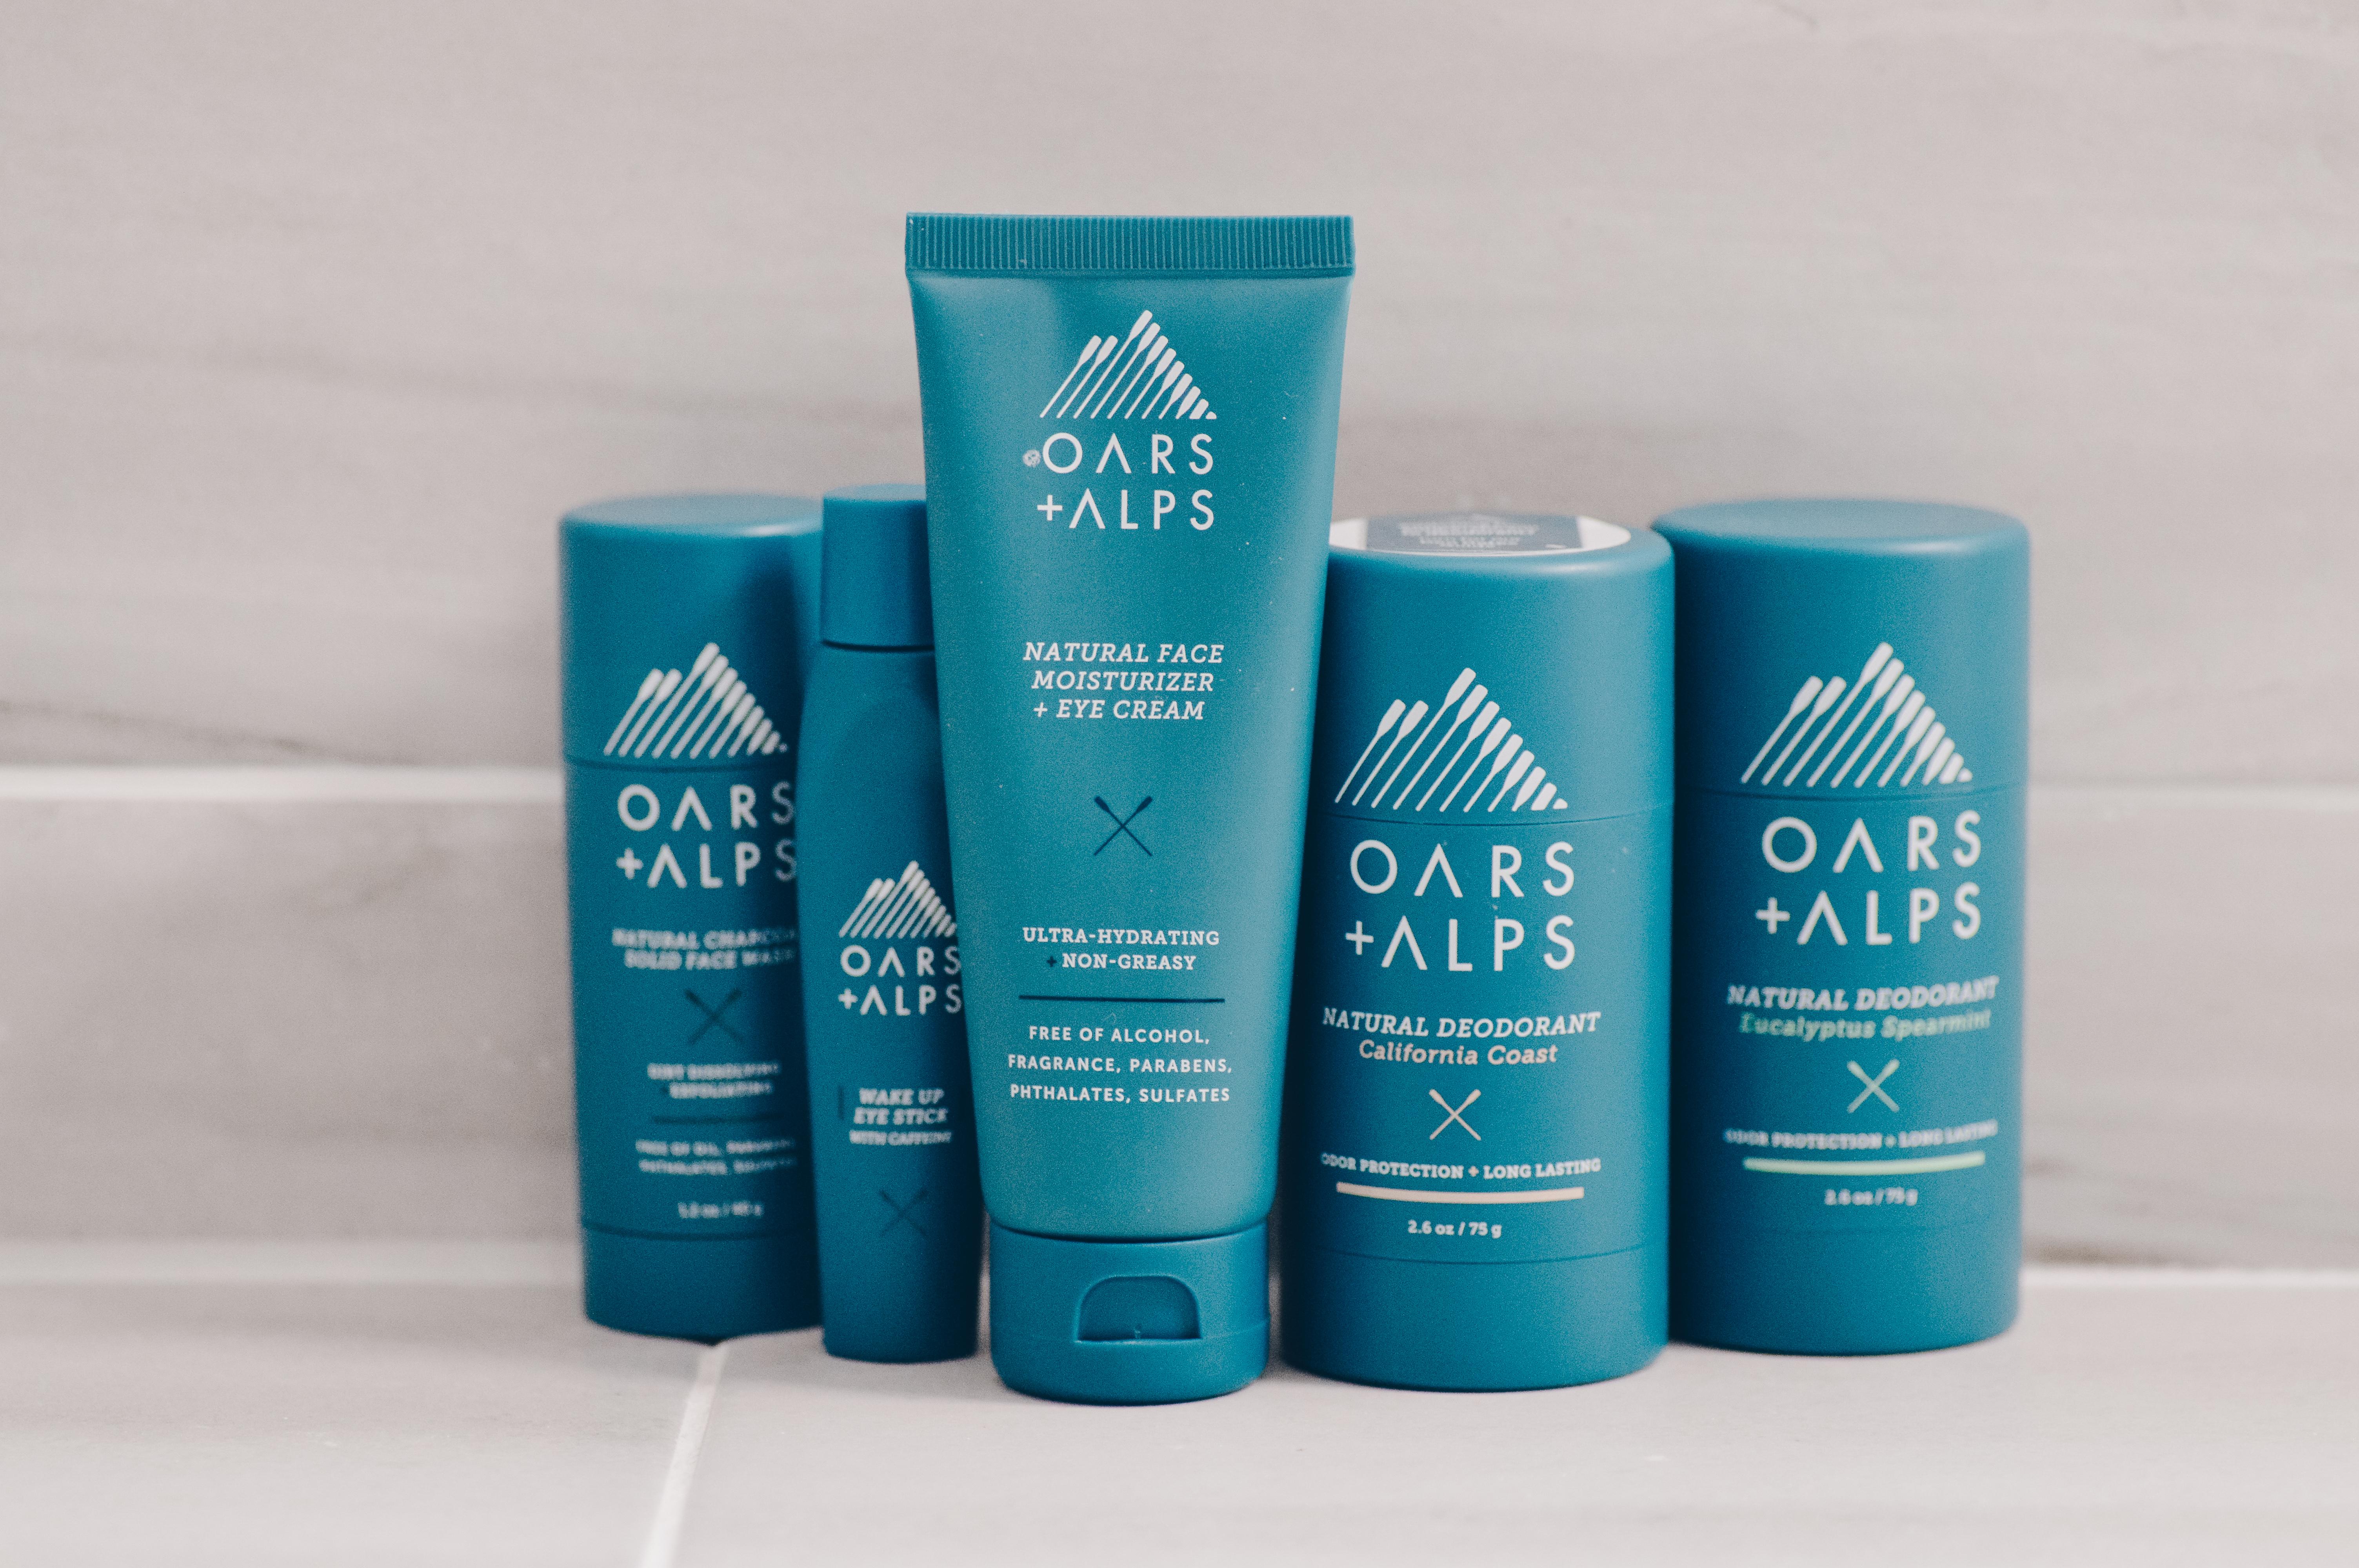 Oars + Alps Premium Brand Skincare